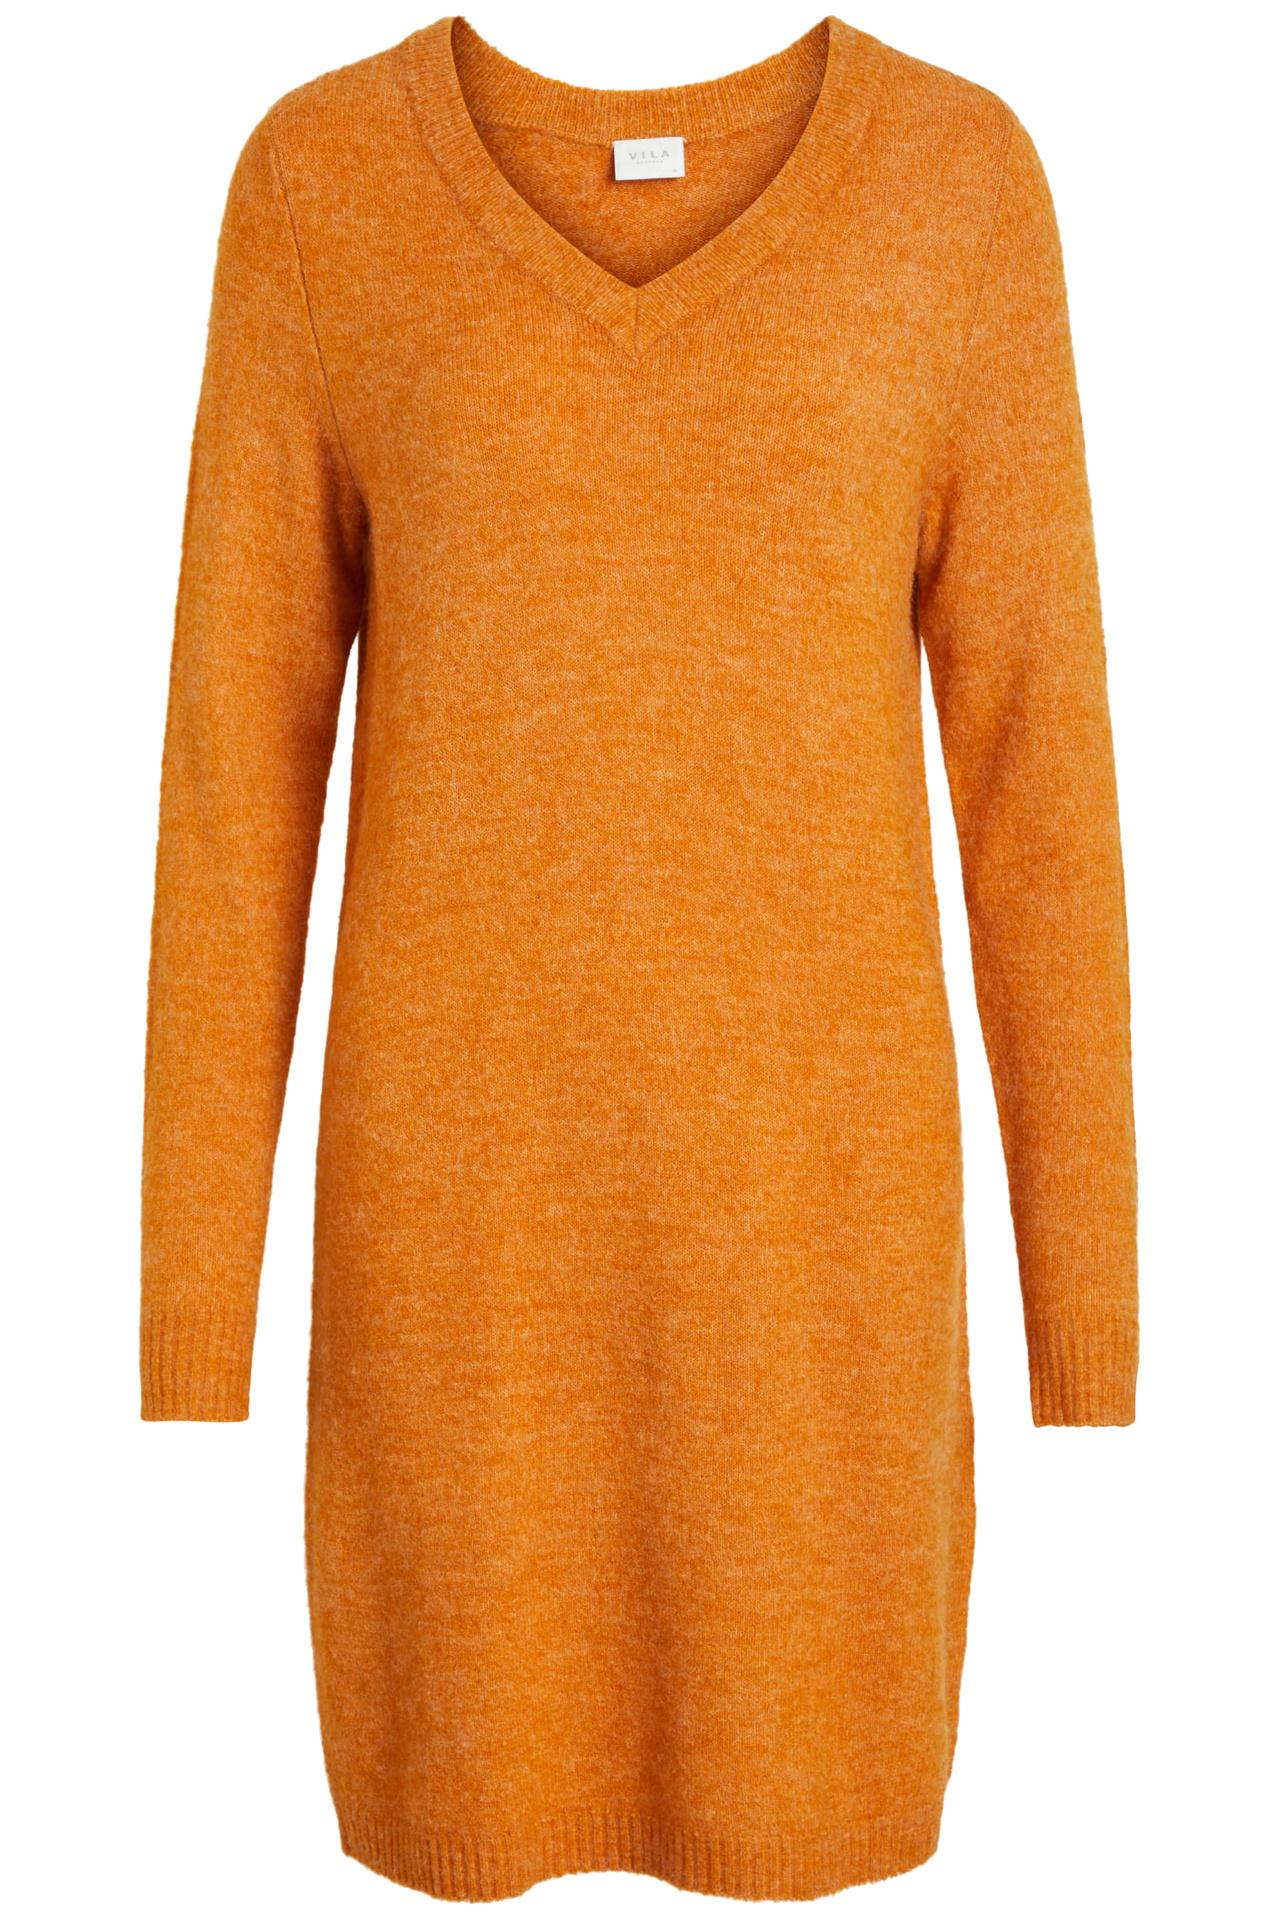 Gebreide jurk trui one size (36 40)